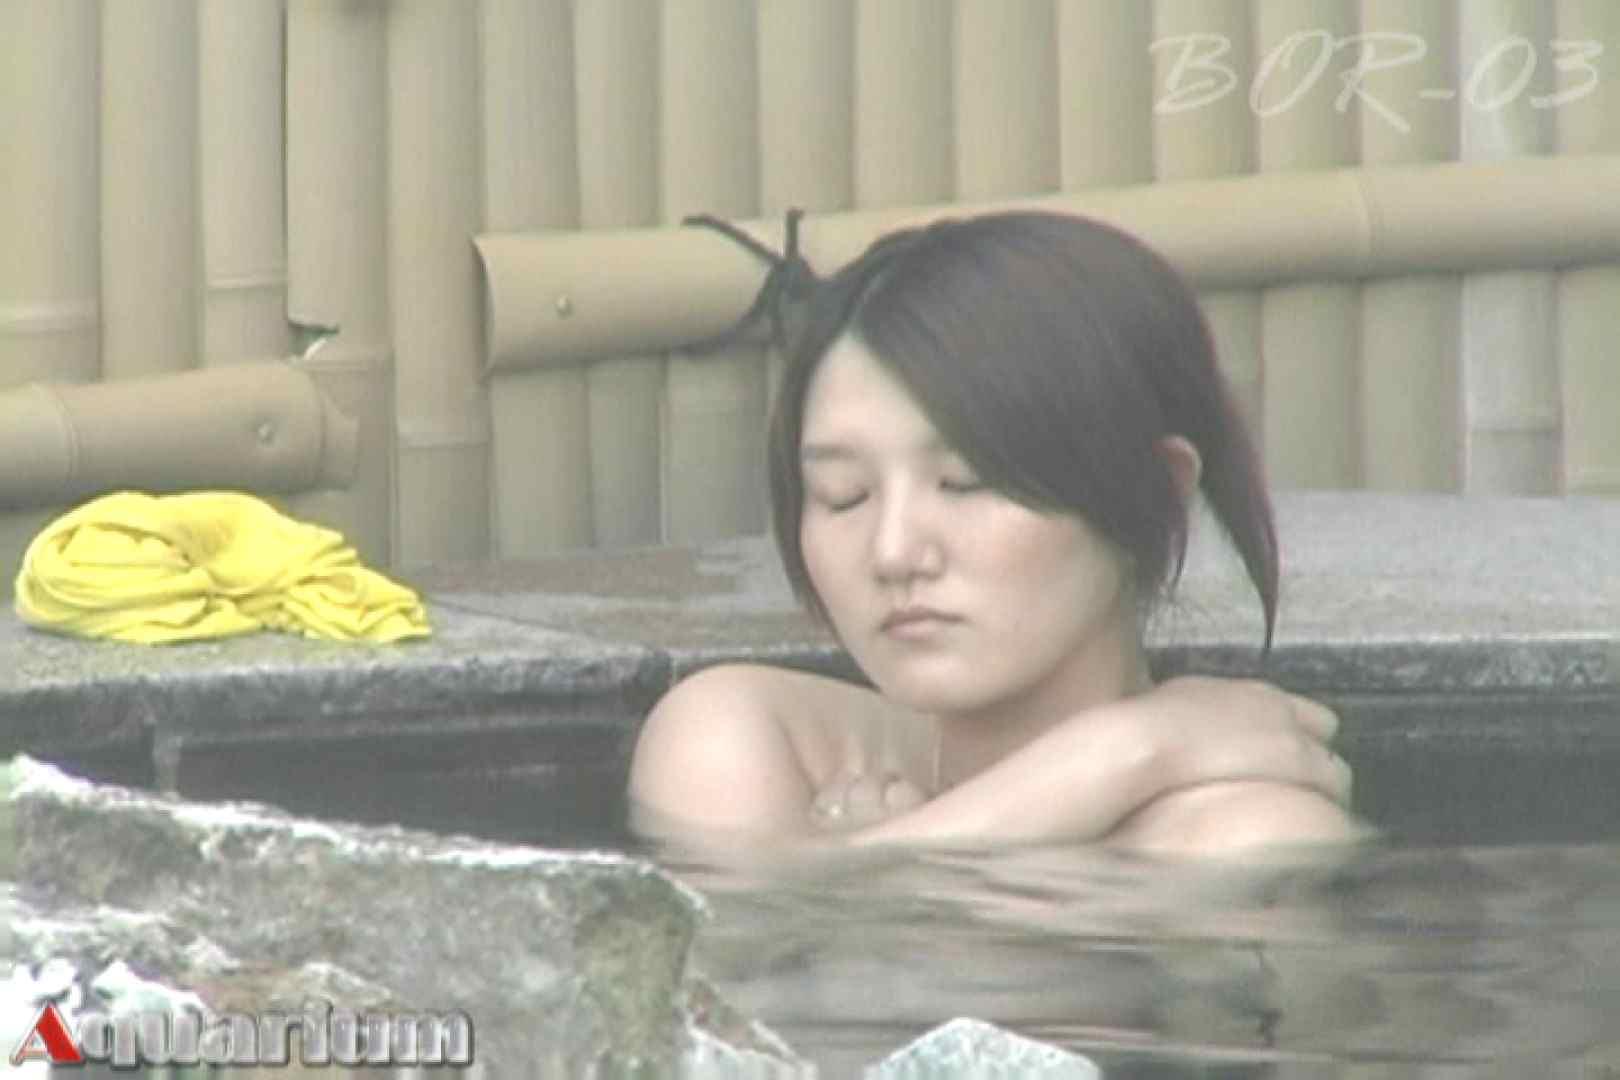 Aquaな露天風呂Vol.487 OLエロ画像 盗撮セックス無修正動画無料 42PICs 29